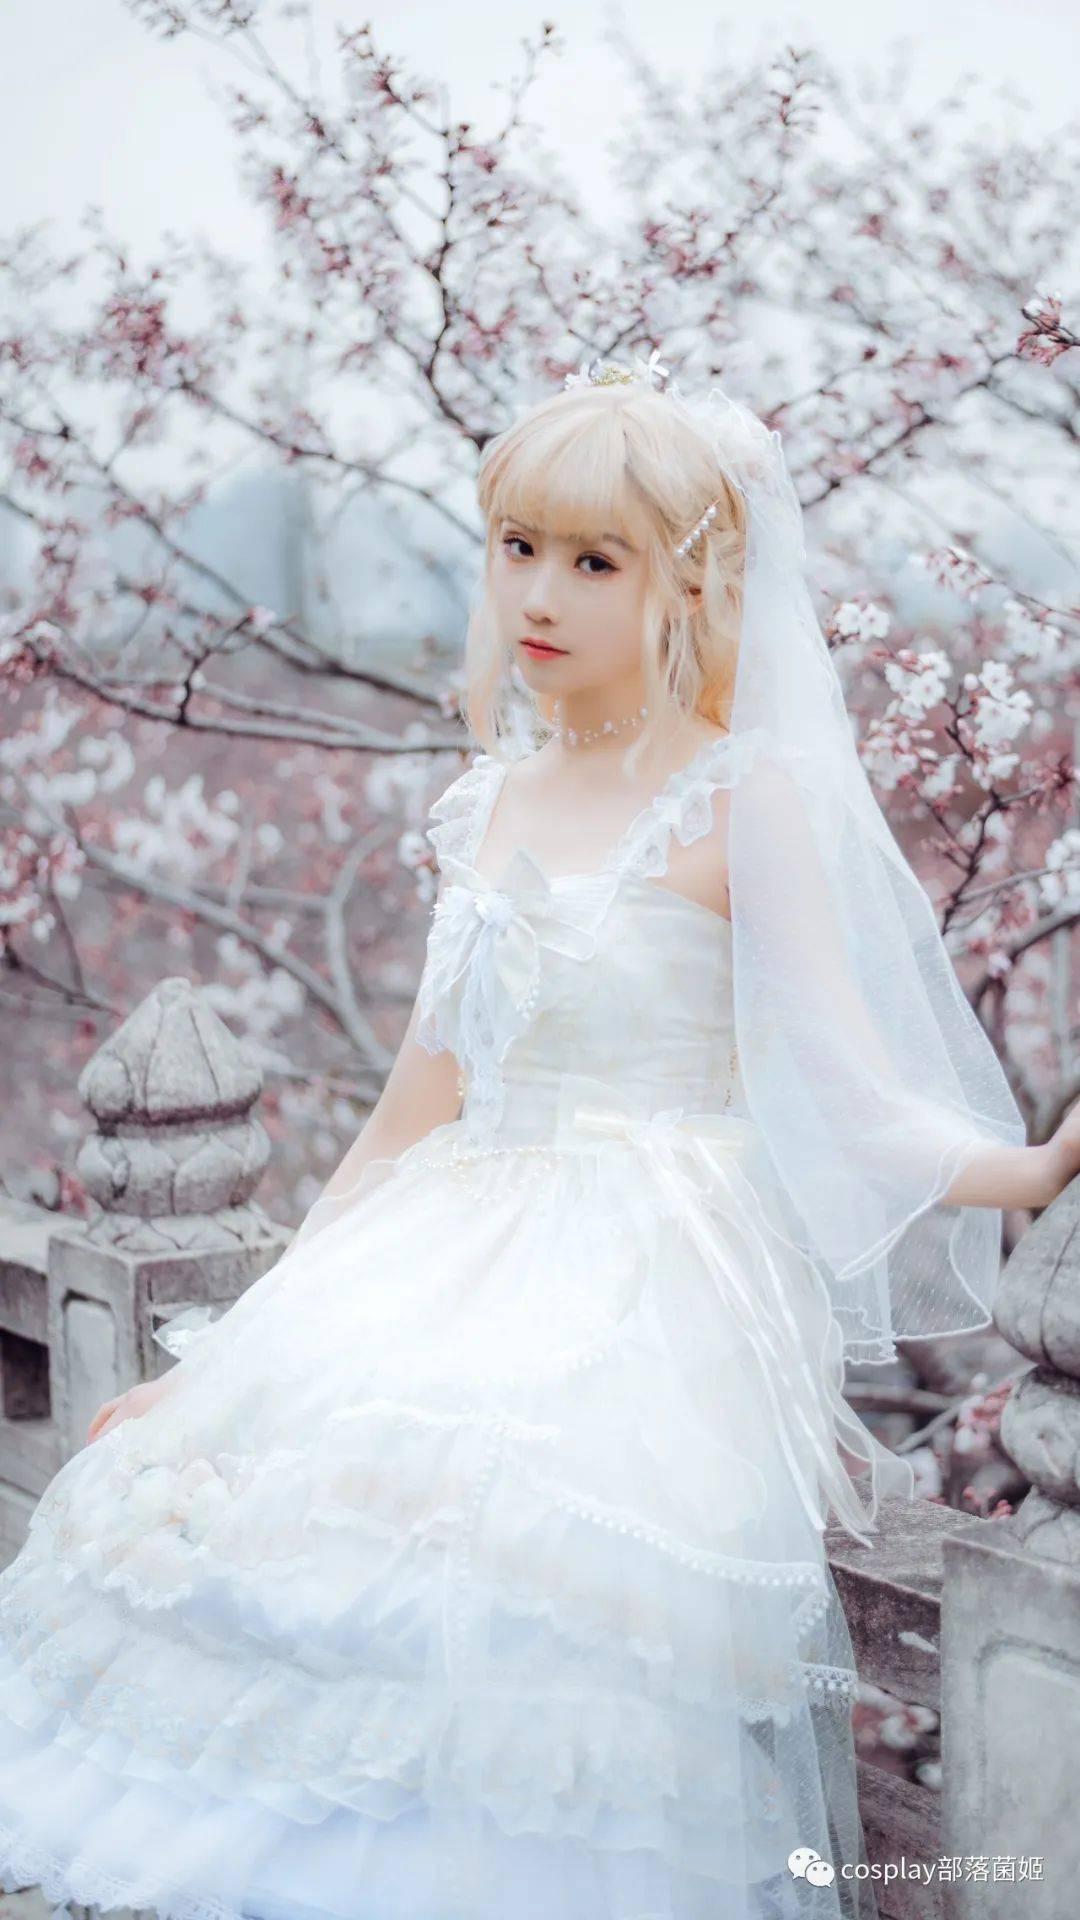 Lolita:愿春天常在,我如春花盛开